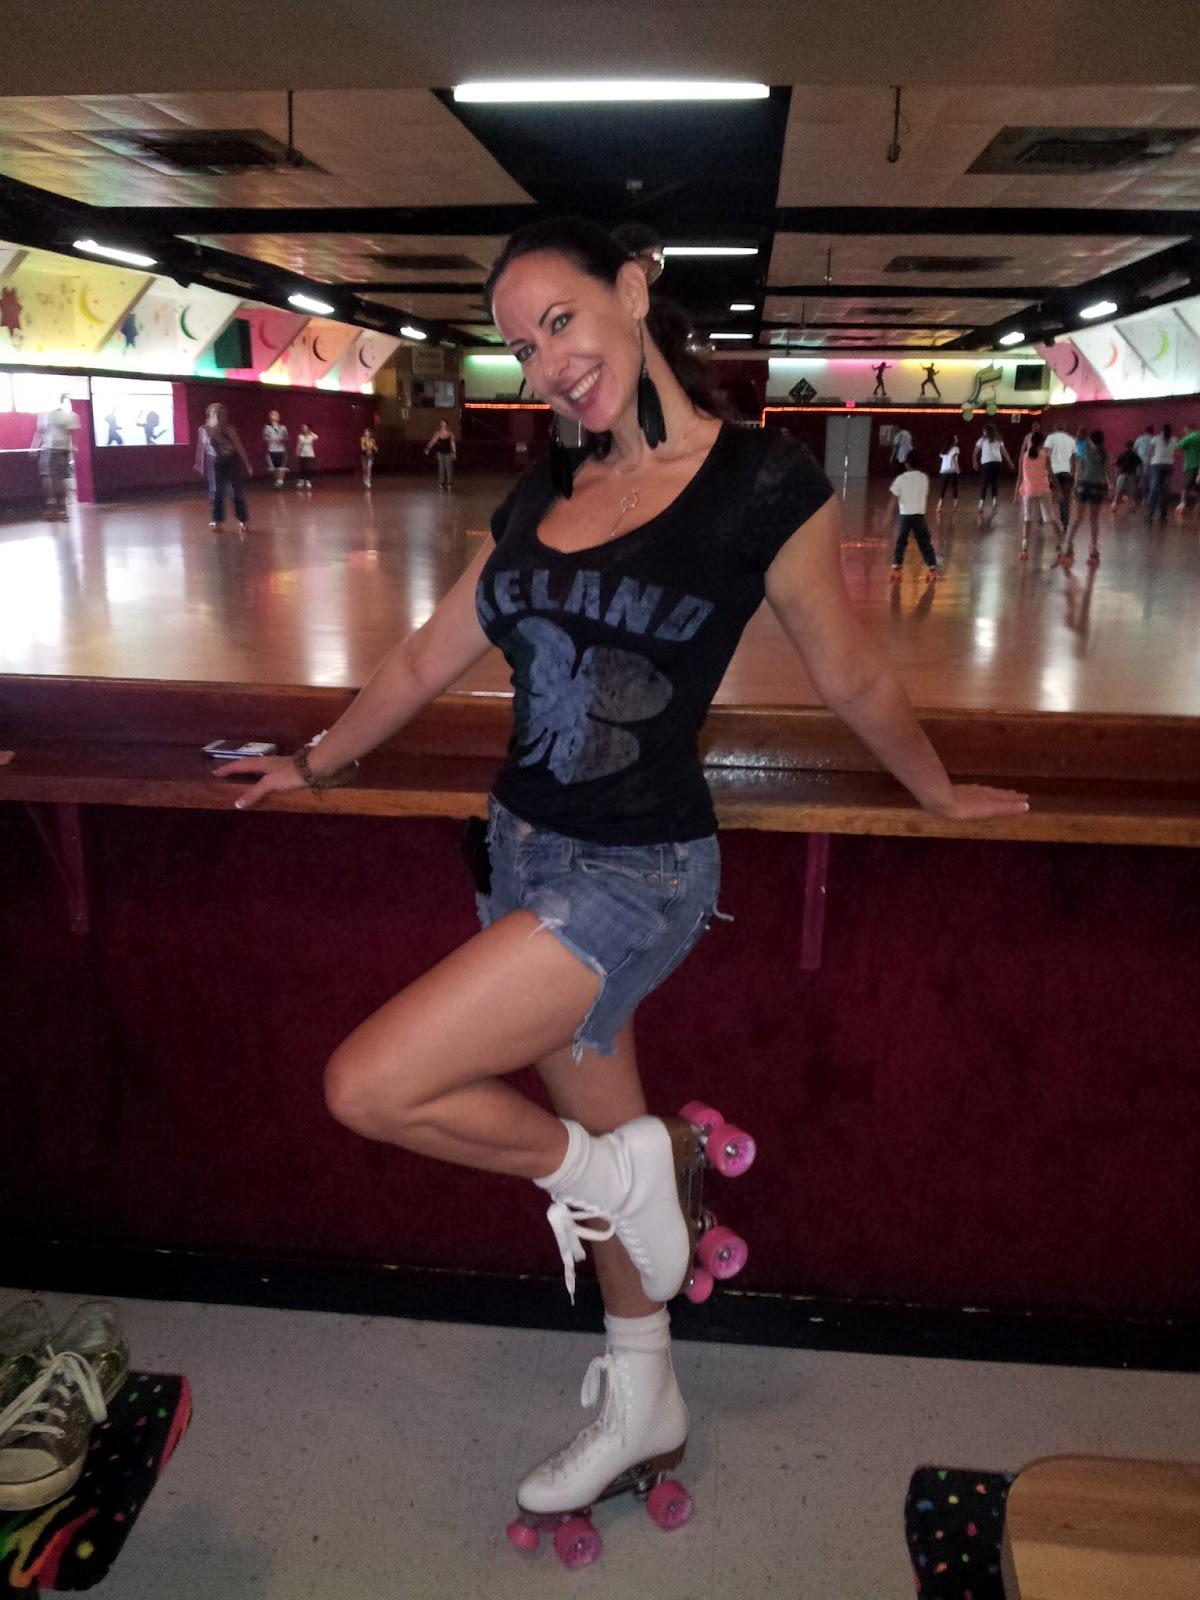 Paris kennedy rollerskates